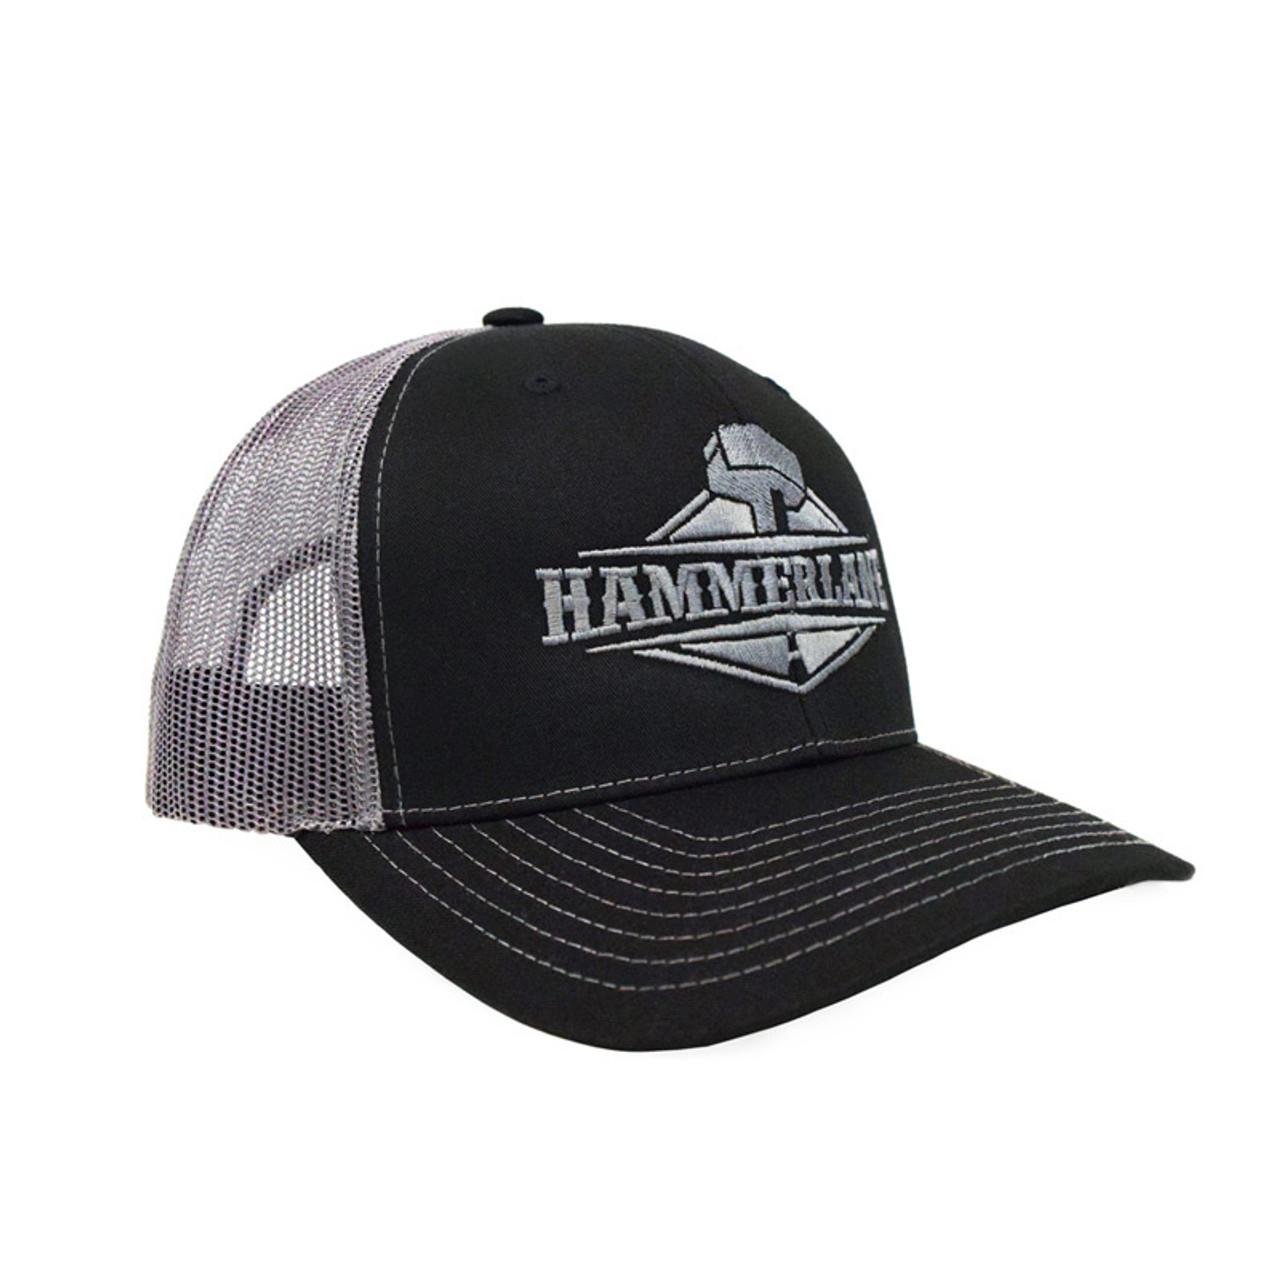 b5cbb47e Snapback Neon Charcoal Silver Hammerlane Hat - LF Truck Centre Ltd.